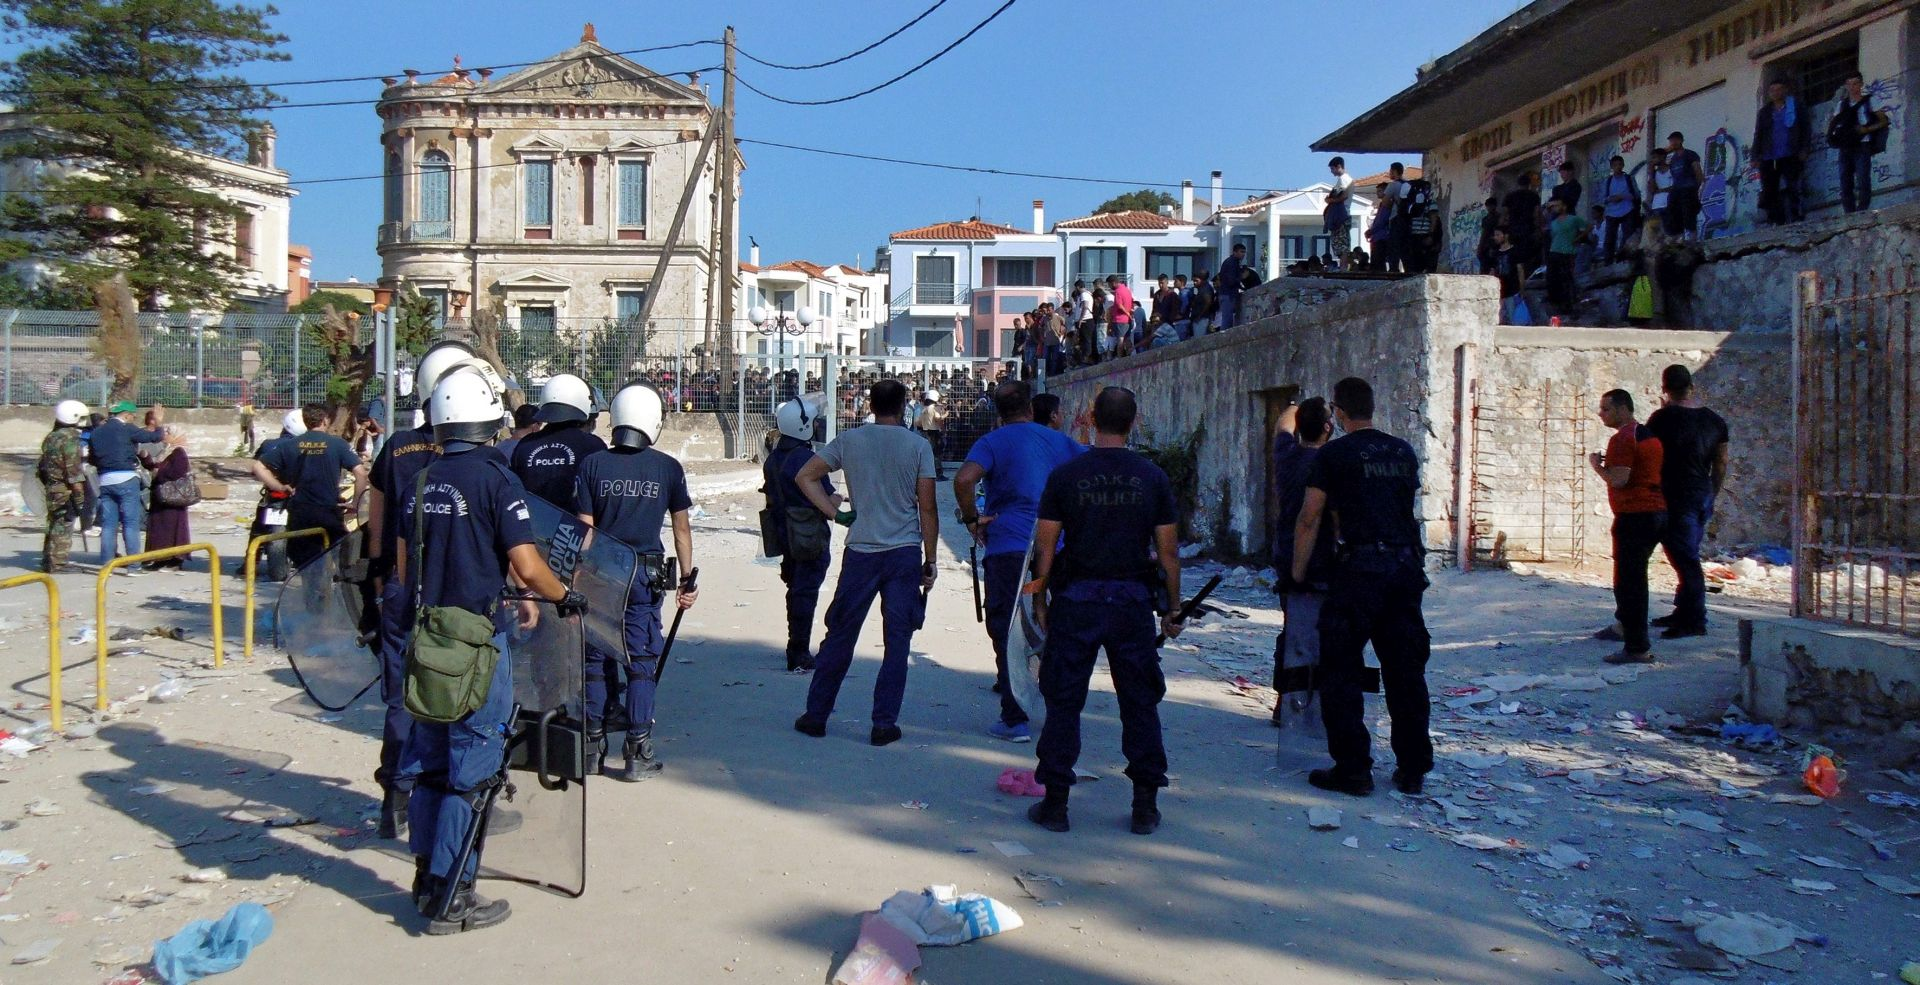 LESBOS Grčka policija palicama napala izbjeglice jer nisu imali dokumente